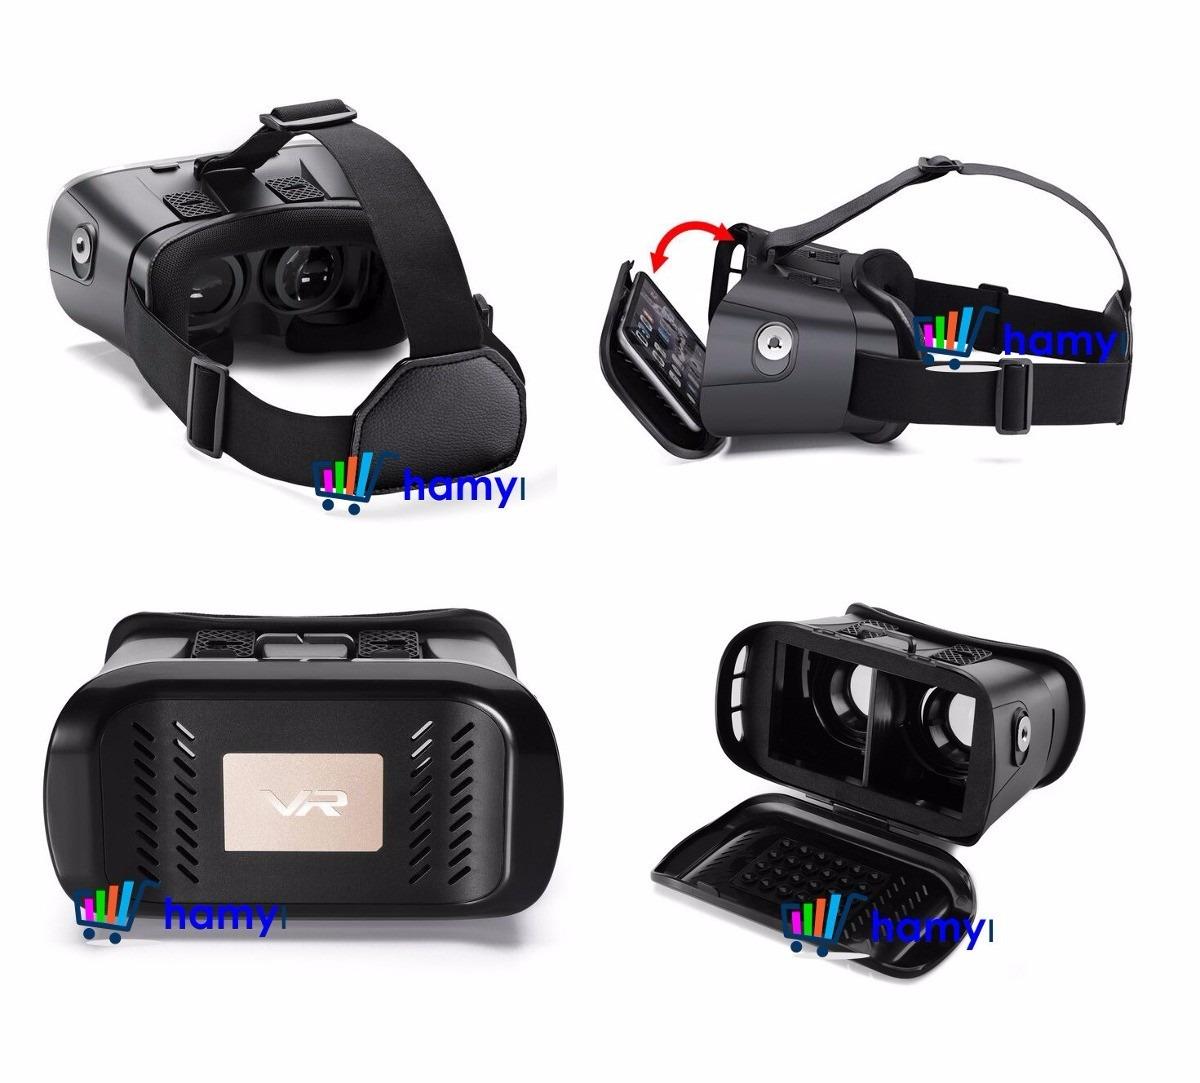 oculos 3d vr box rift com imã realidade virtual controle p07 · oculos  realidade virtual. Carregando zoom. 04423bb083